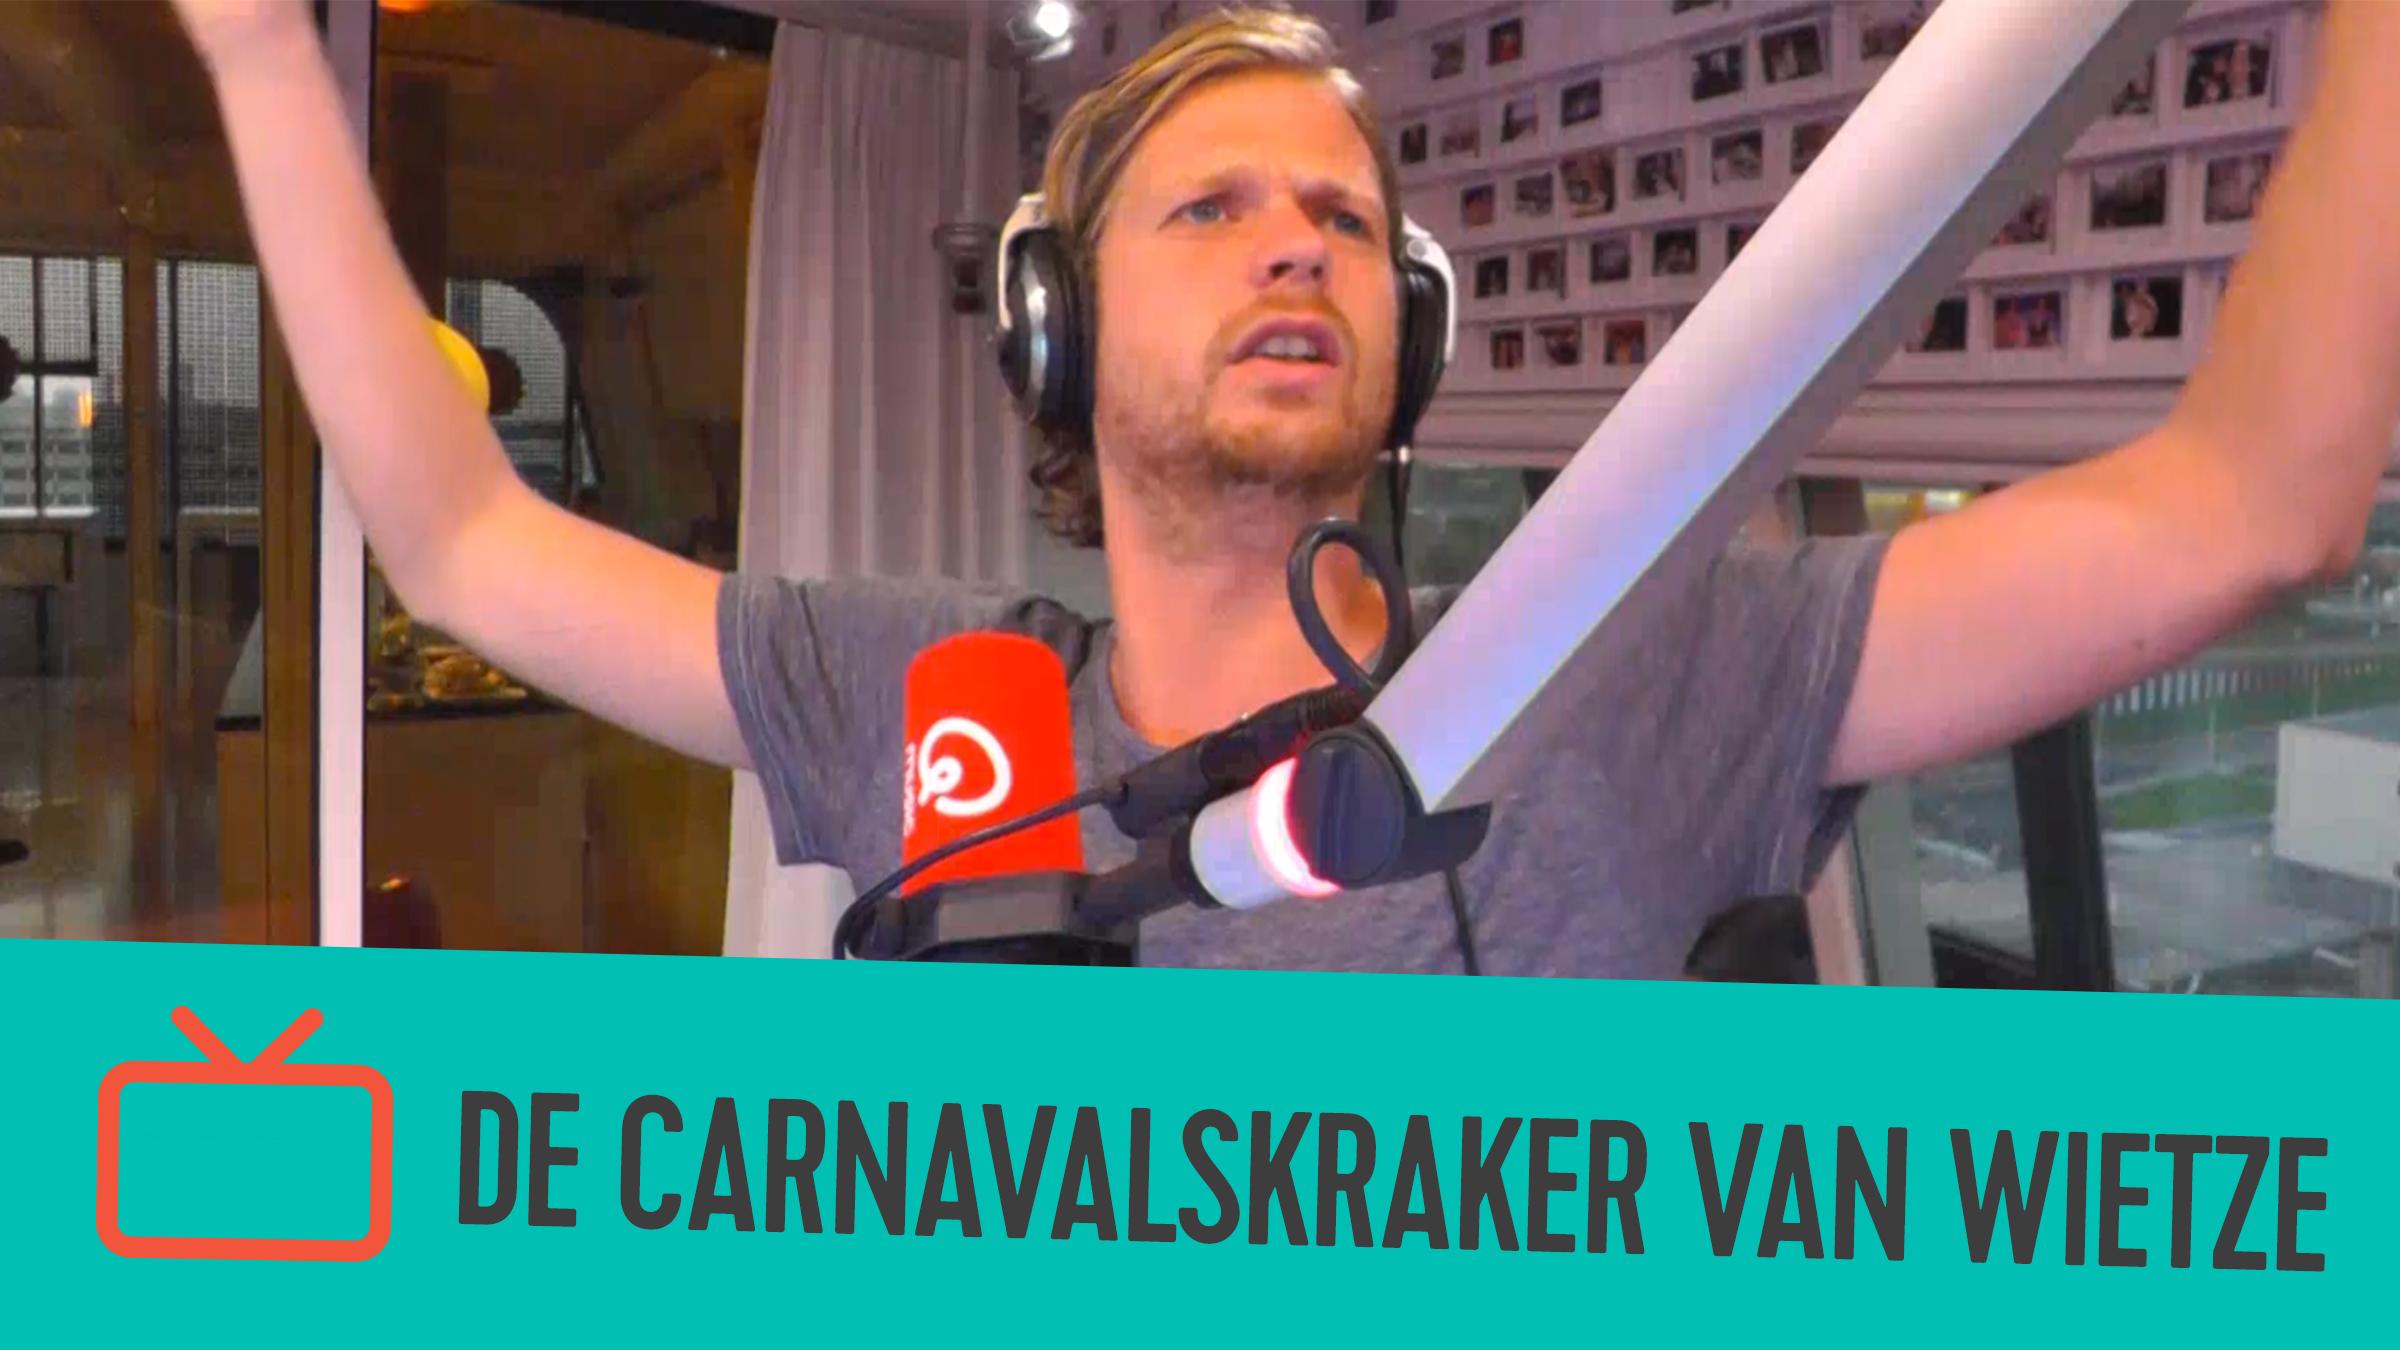 Carnavalskraker